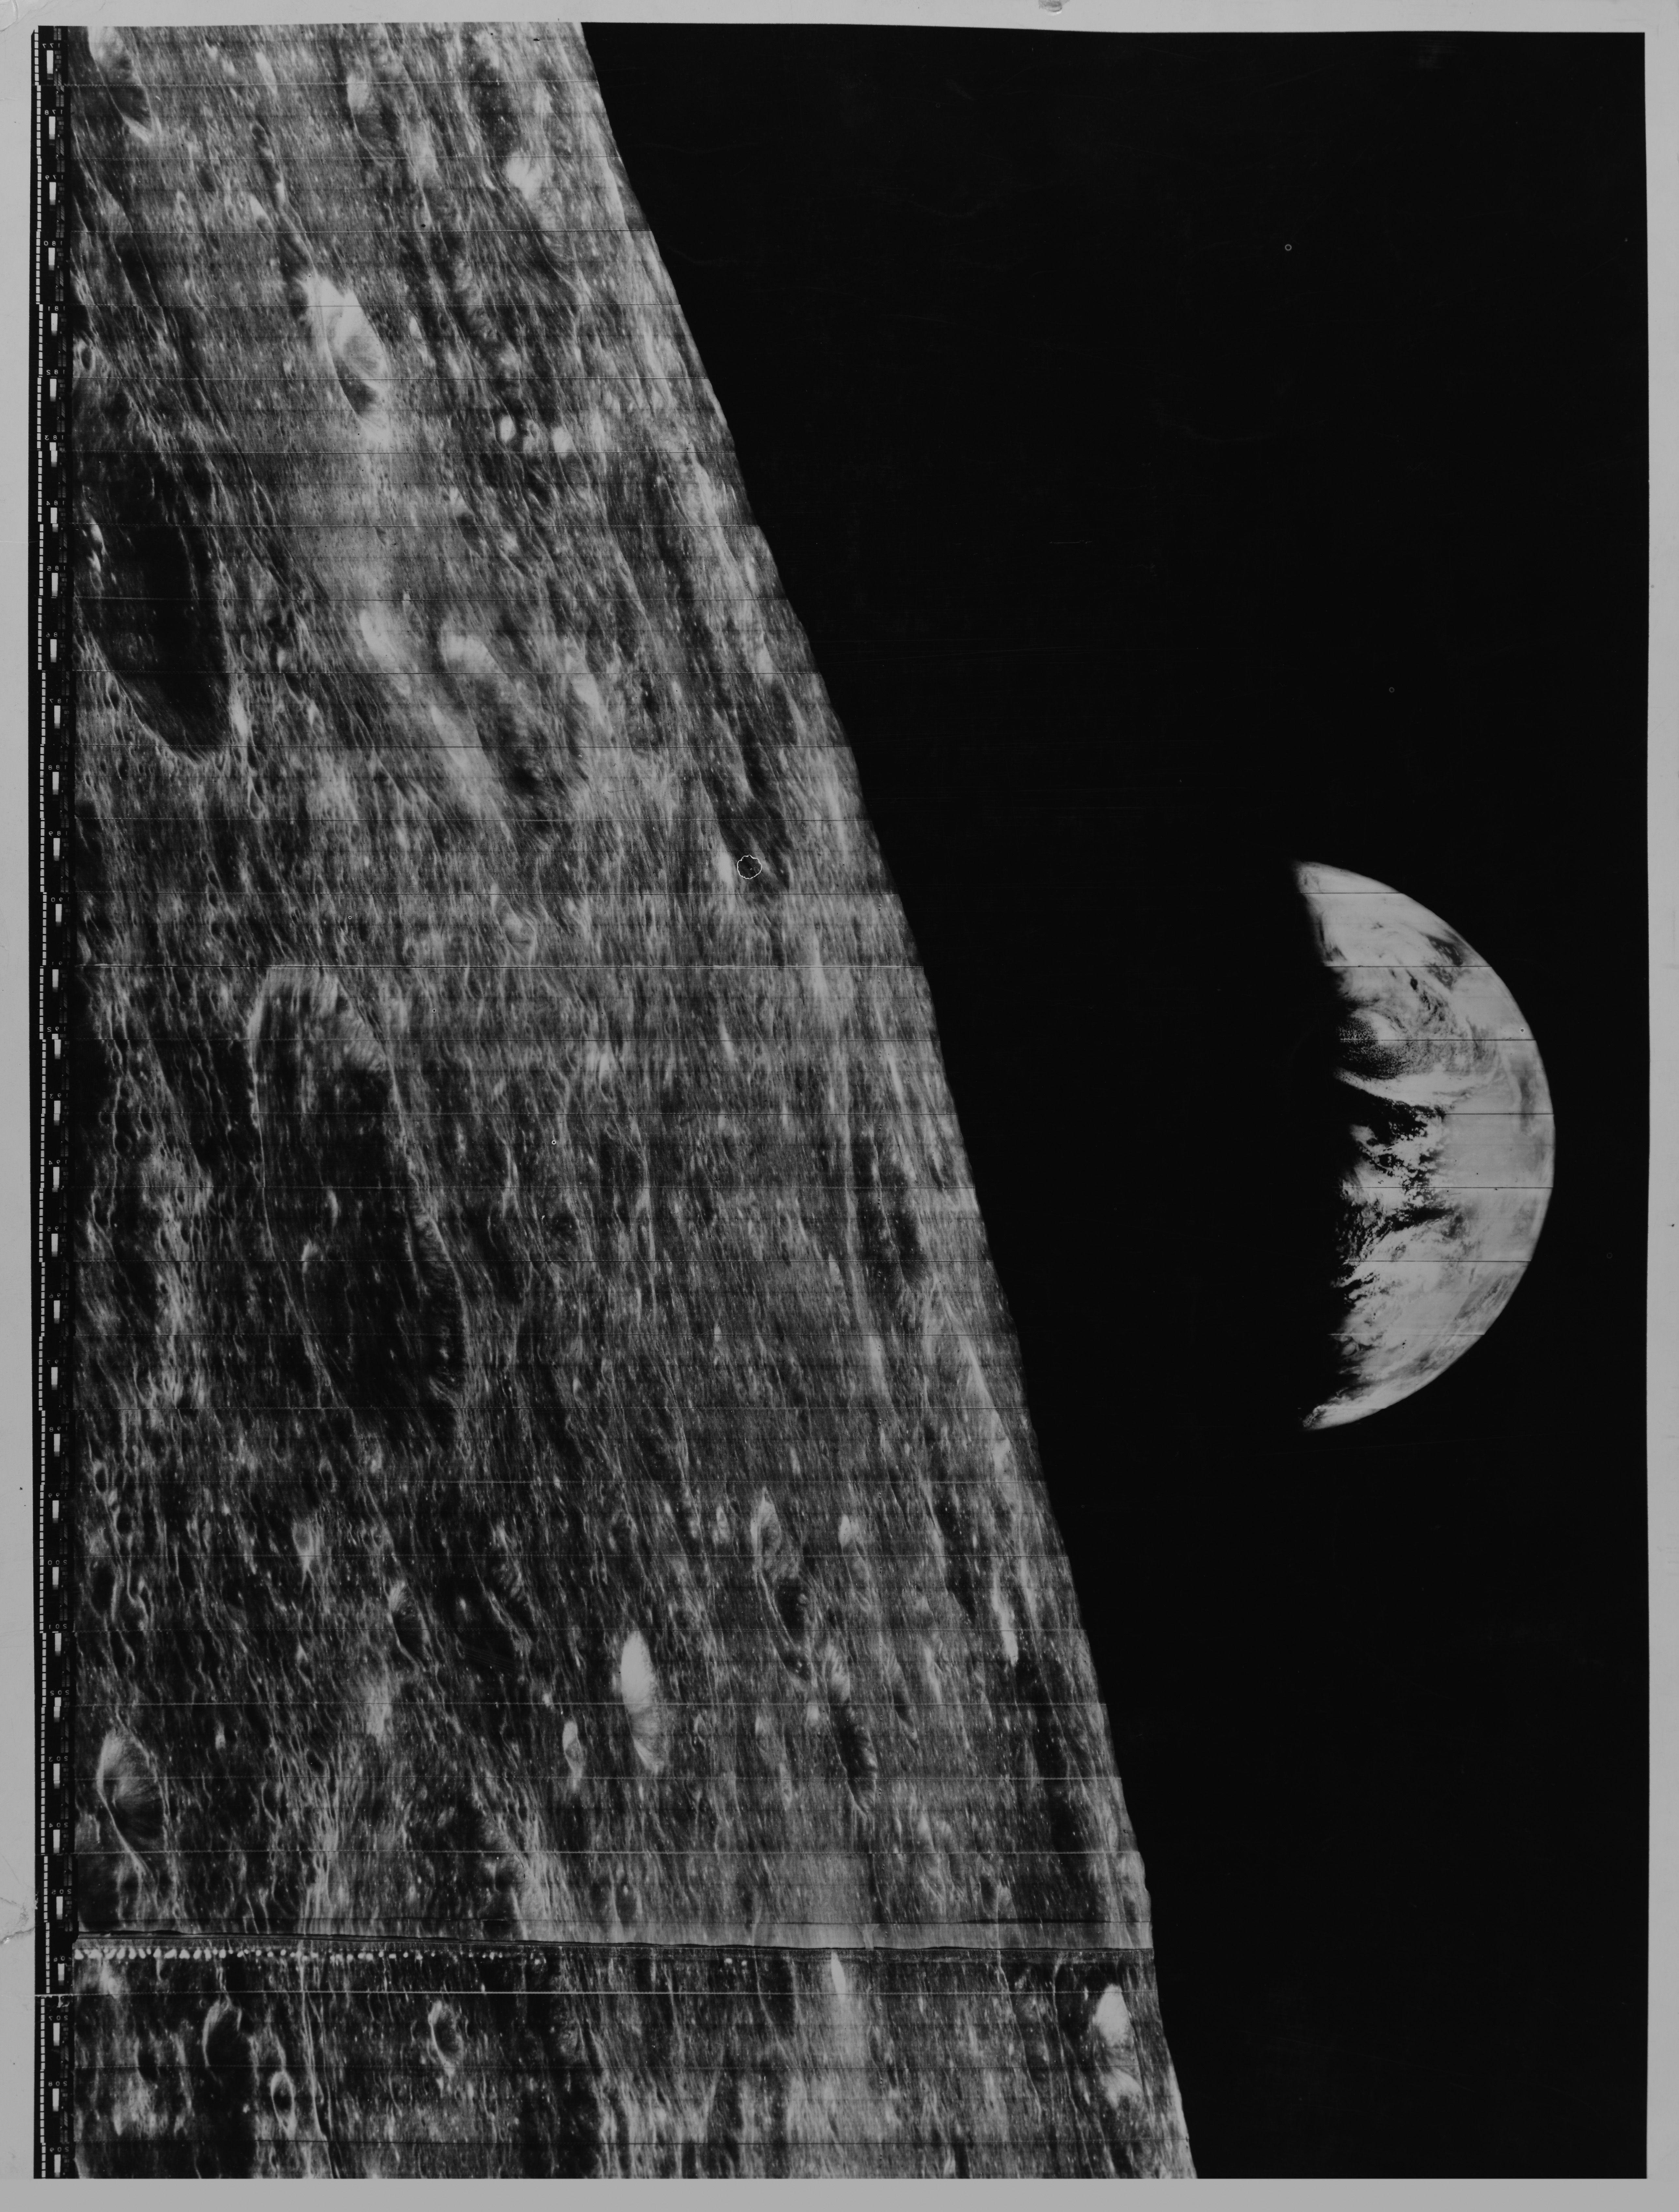 moon & earth - lunar orbiter (1966)